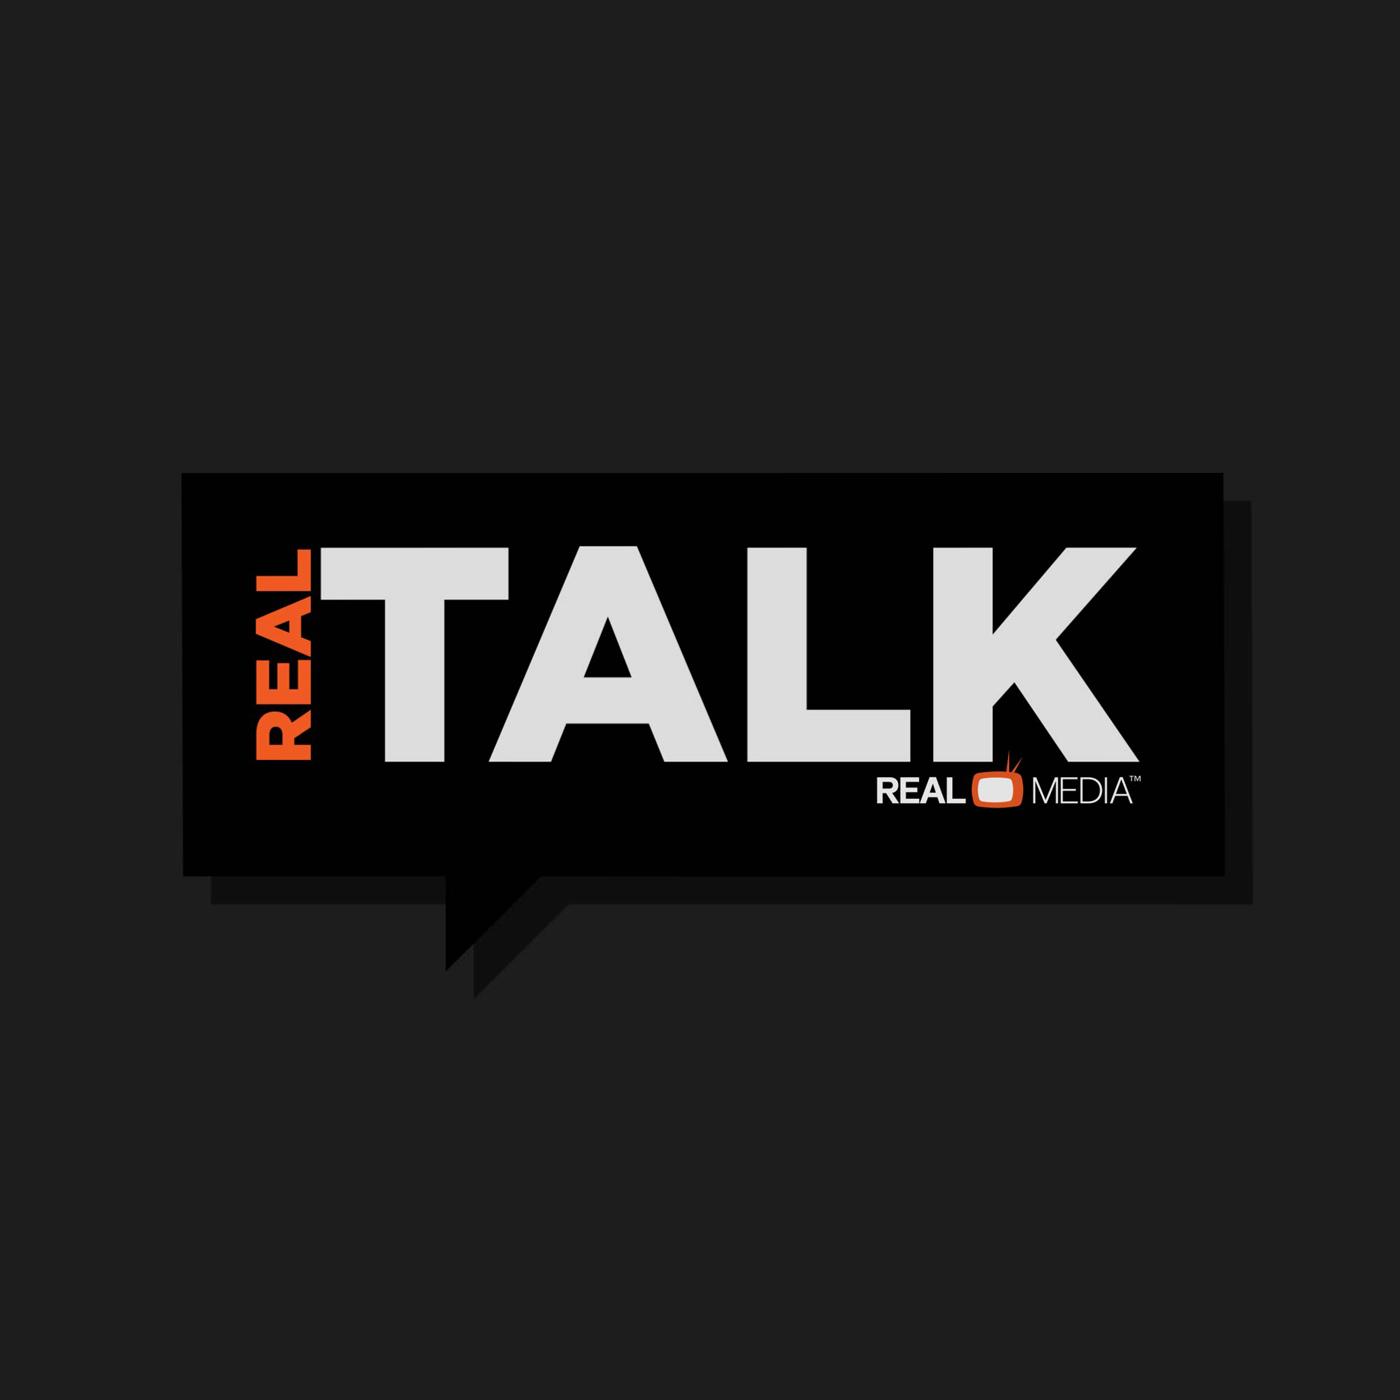 REALTALK with Real Media by info@realme com (info@realme com